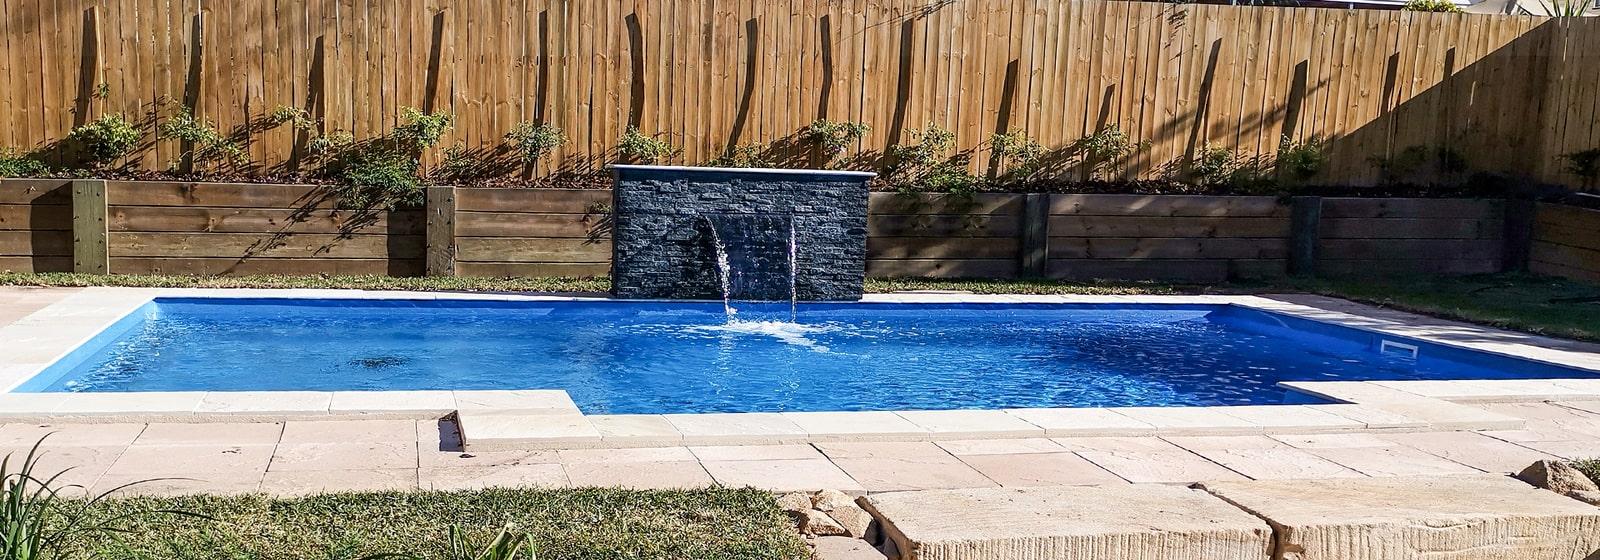 Sapphire Starlight Pool Builder Brisbane